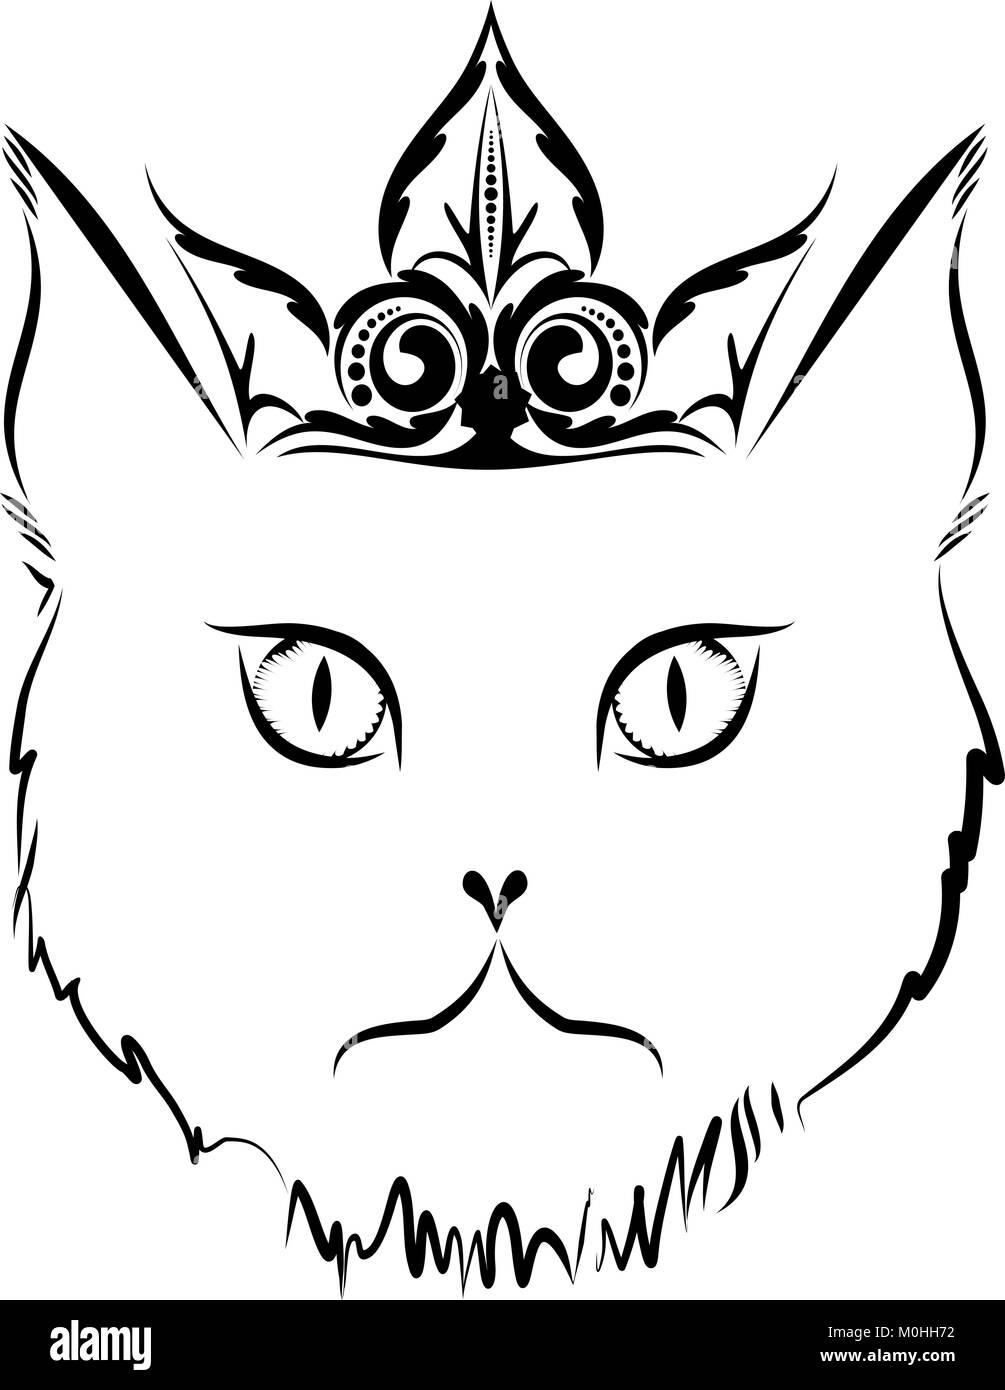 Cat tattoo. - Stock Image